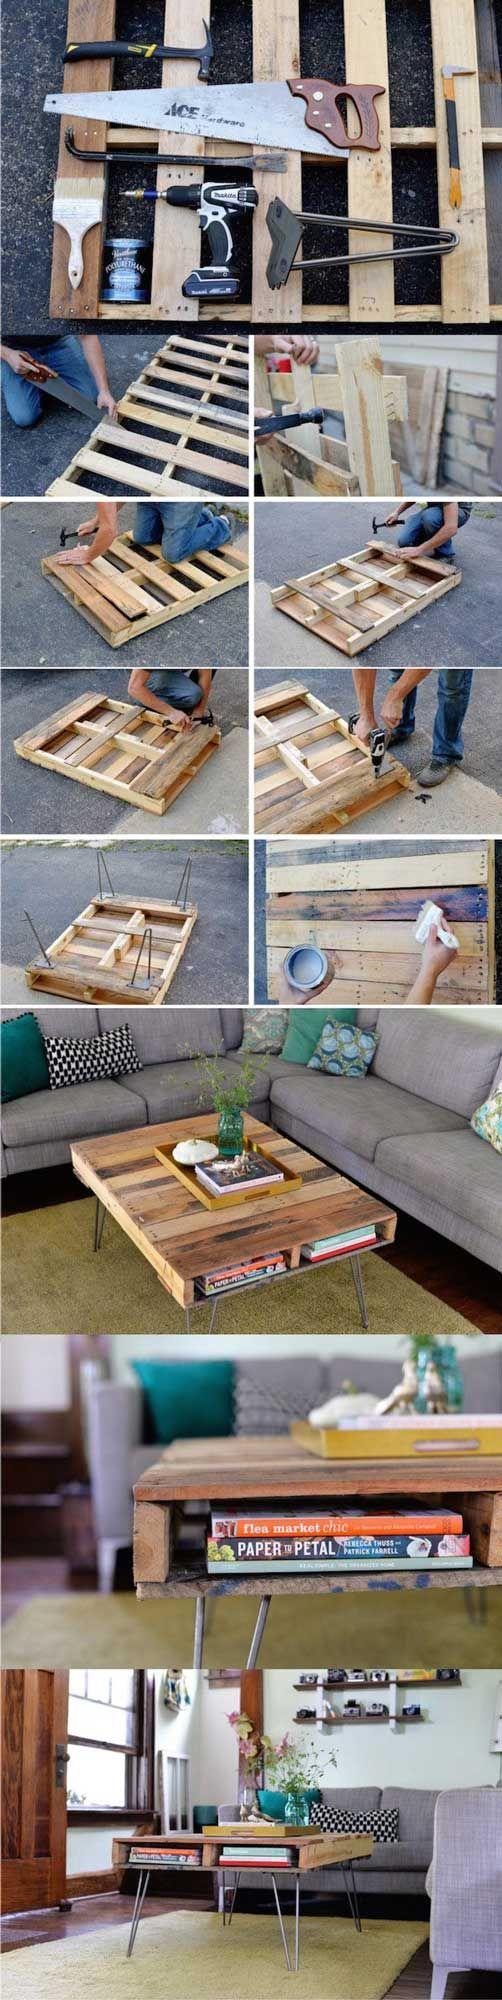 ahsap-paletten-orta-sehpa-yapimi | Ev dekor | Pinterest | Balkon und ...